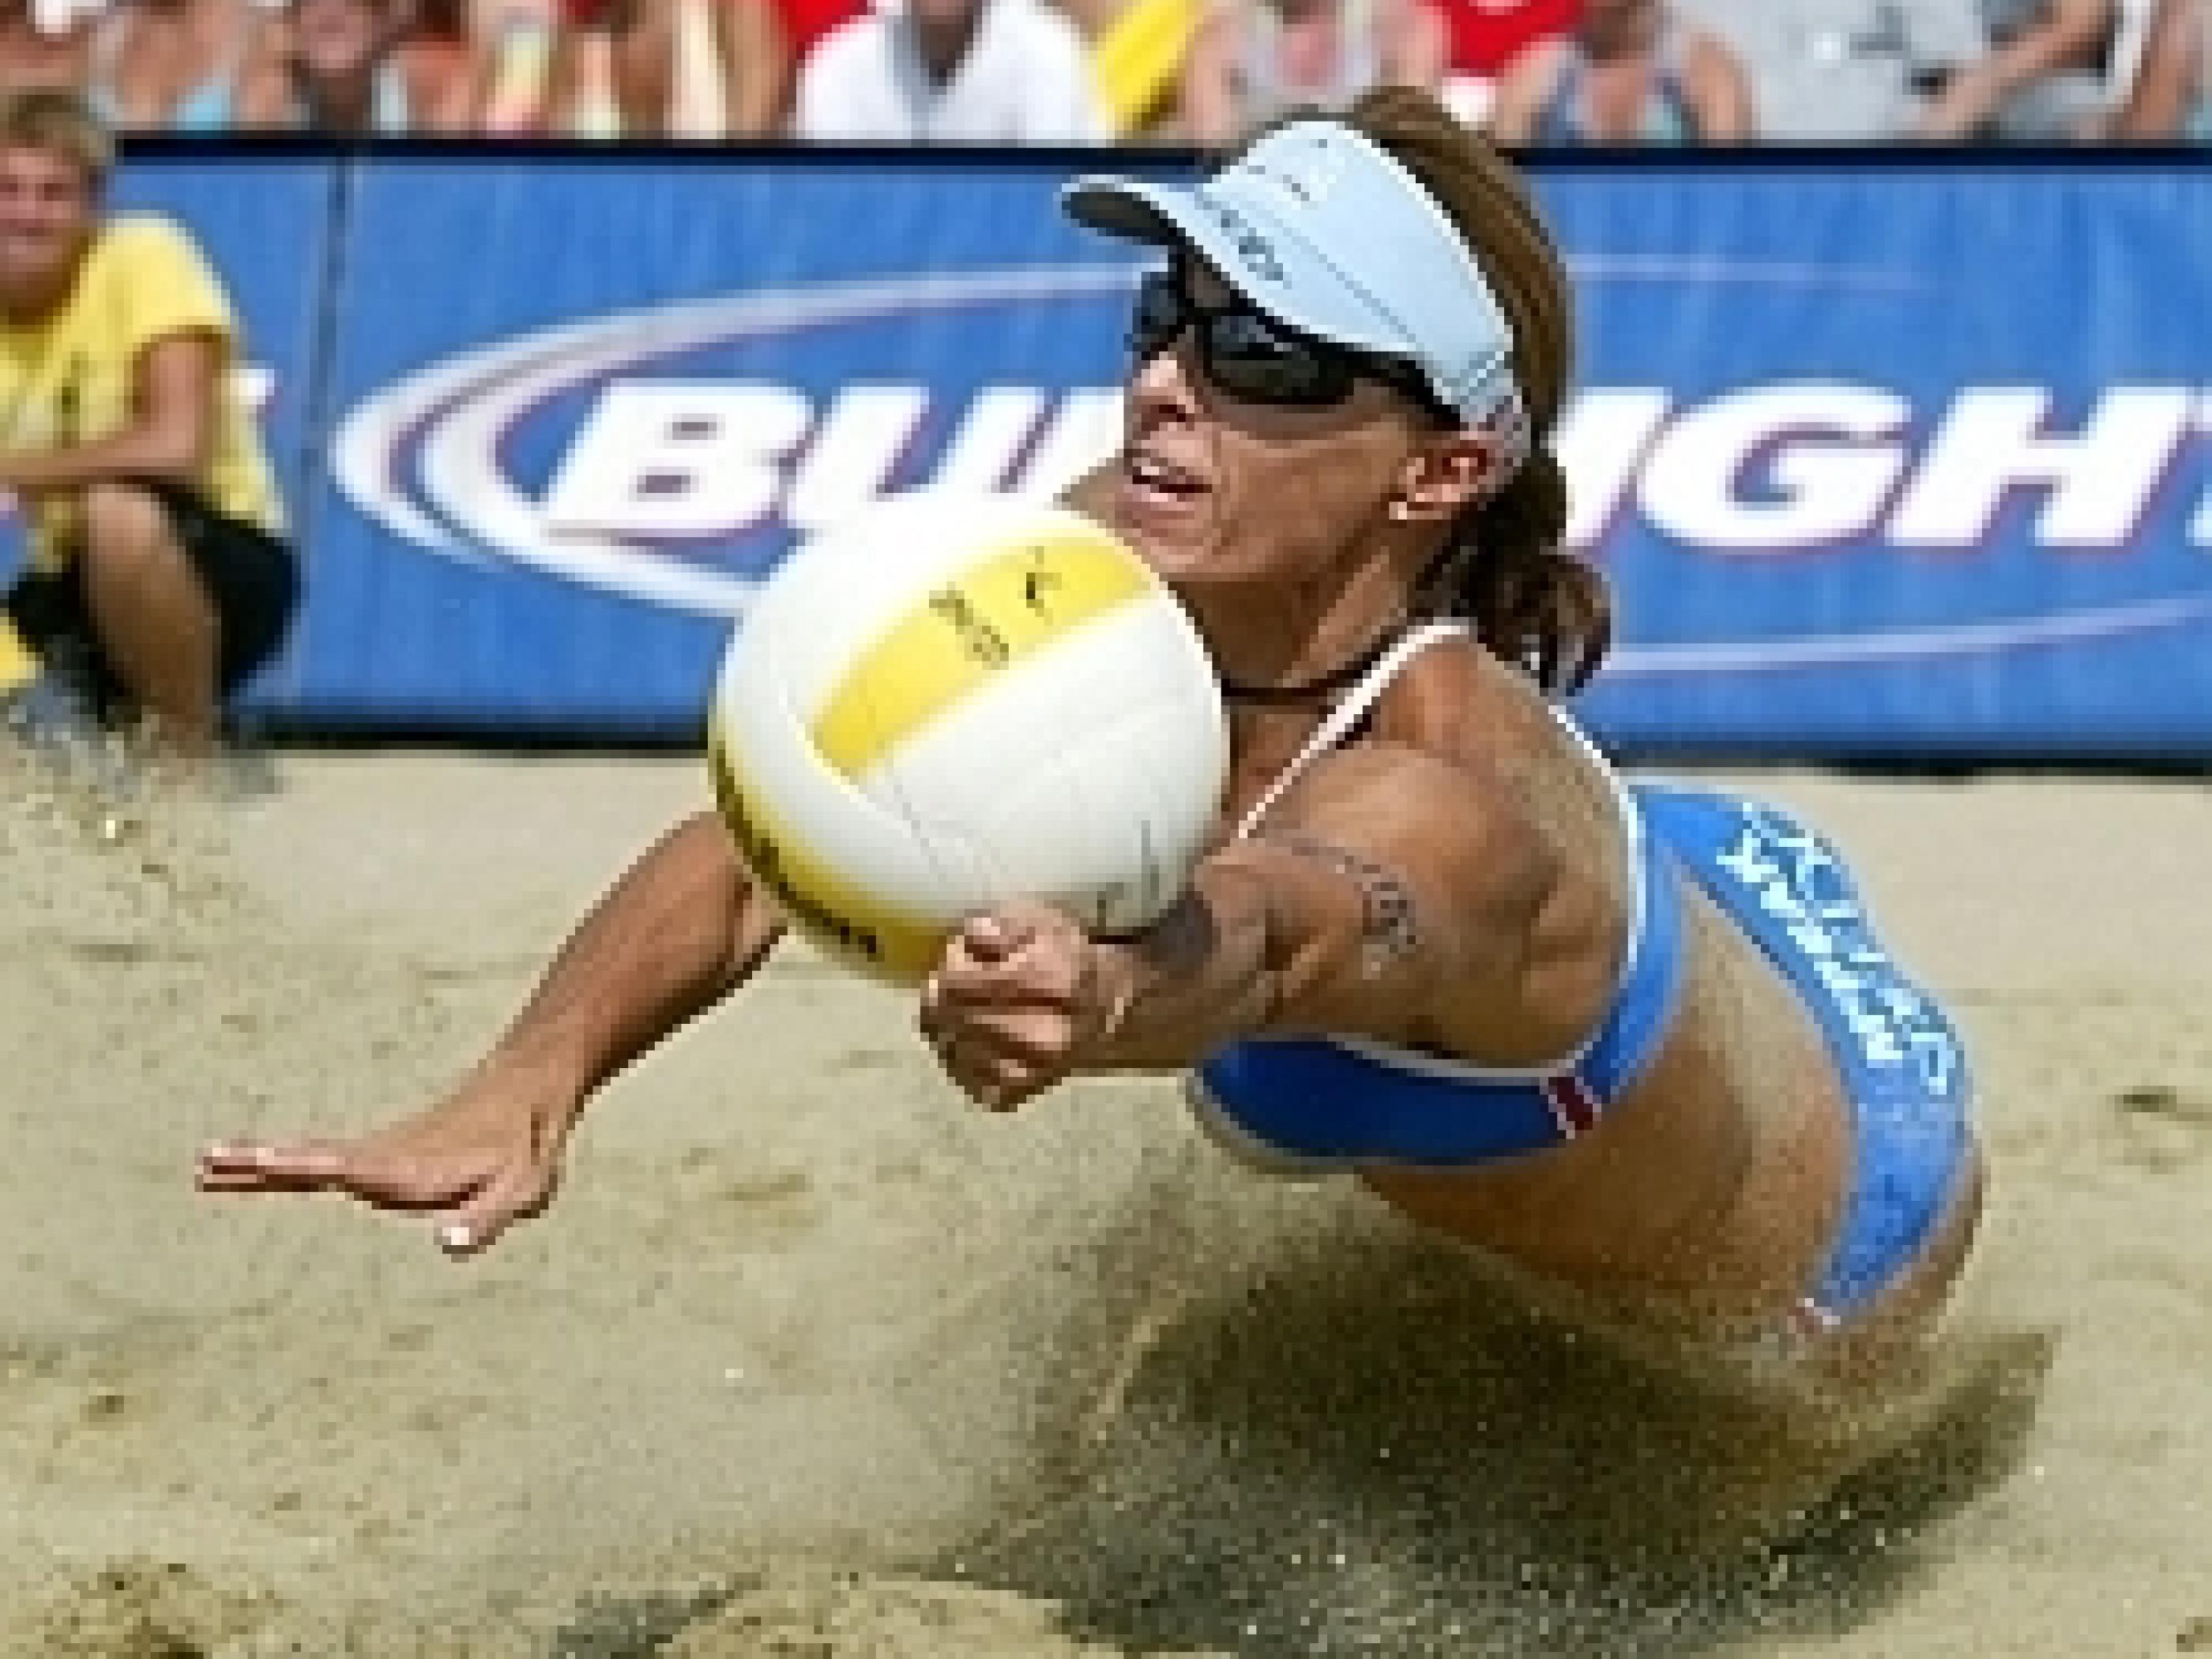 Huntington Beach, California: Laid Back Fun and Beach Culture